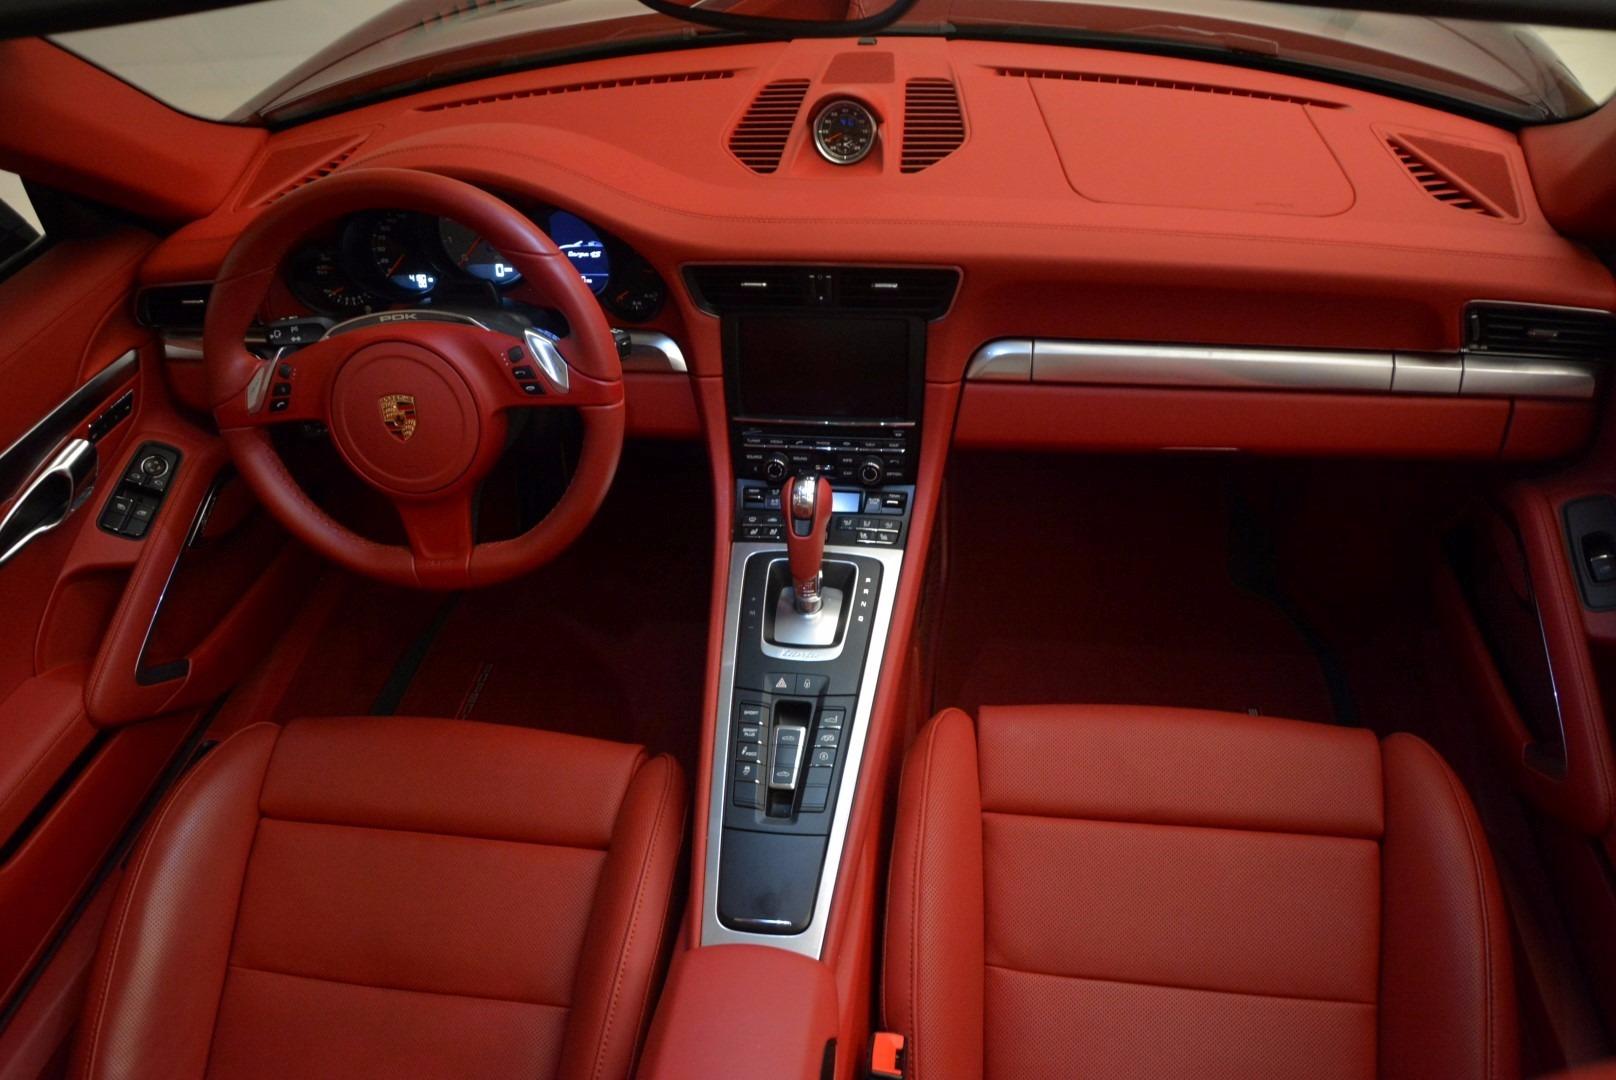 Used 2015 Porsche 911 Targa 4S For Sale In Greenwich, CT 1476_p24